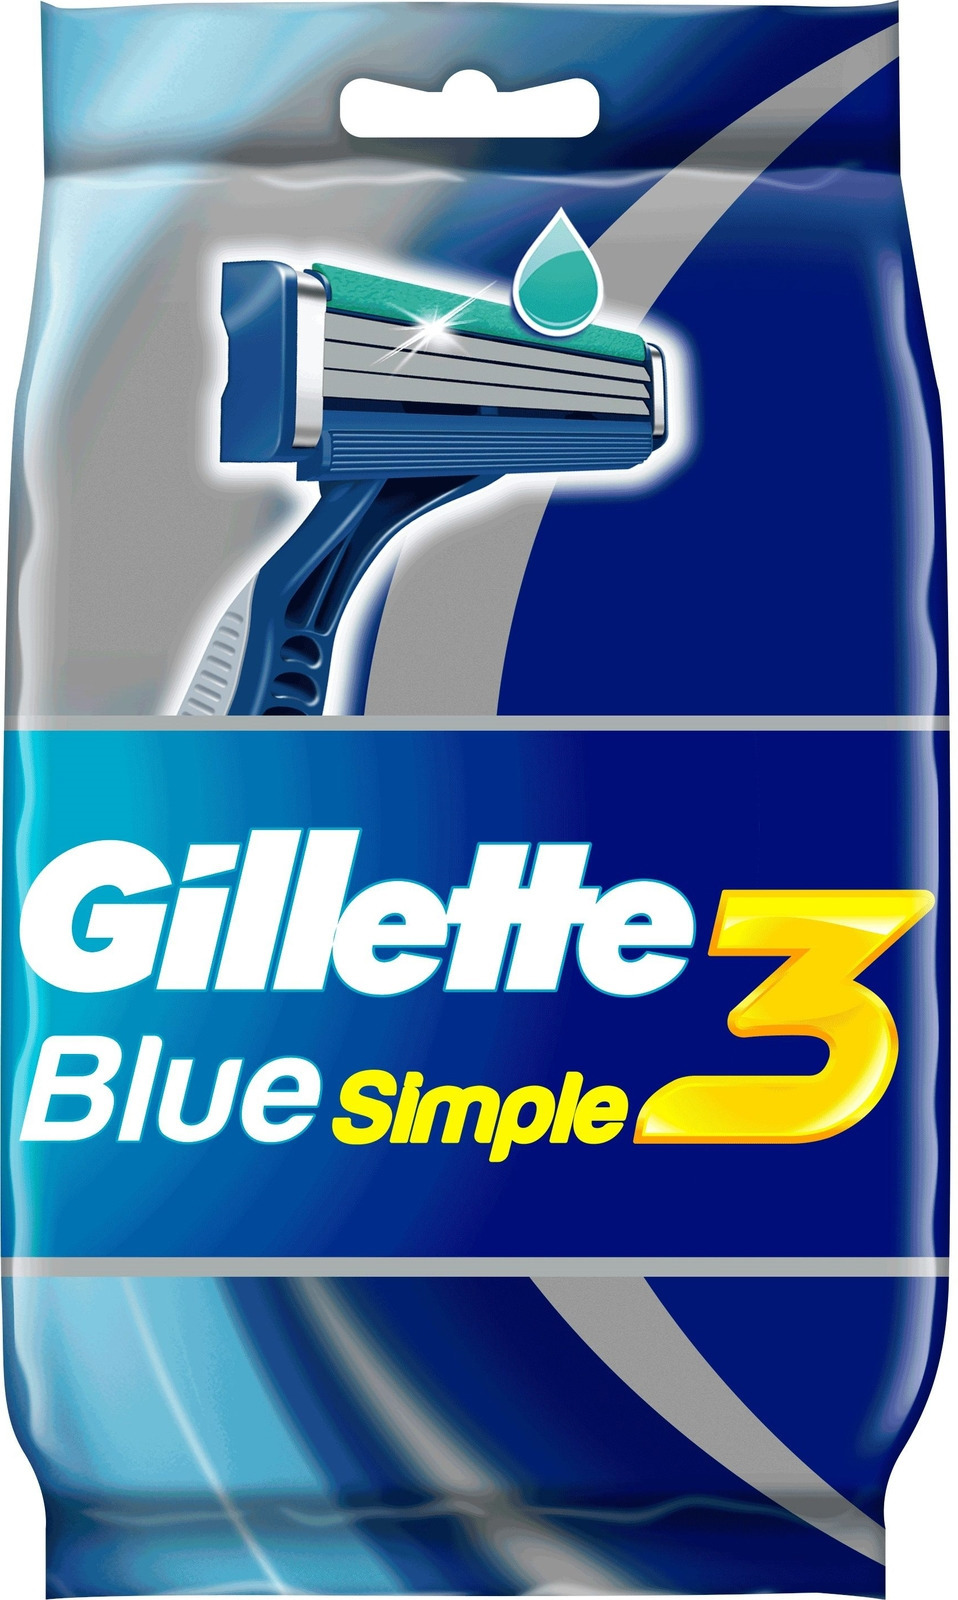 Gillette Blue Simple3 одноразовые мужские бритвы, 4шт одноразовые бритвы для женщин gillette venus 3 3шт